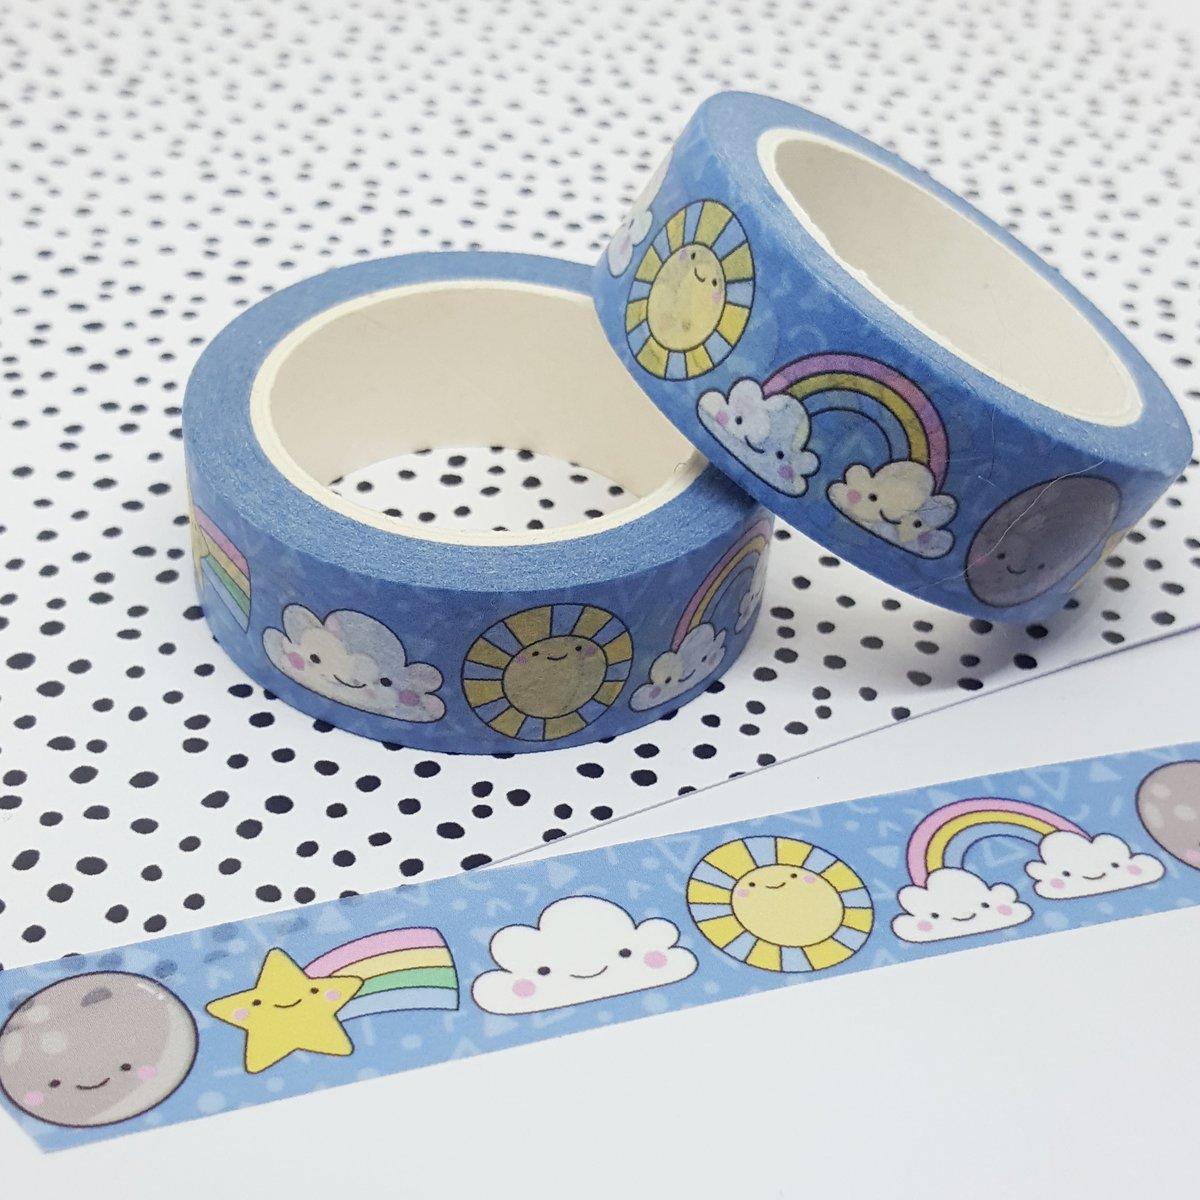 Smiley Skies Washi Tape